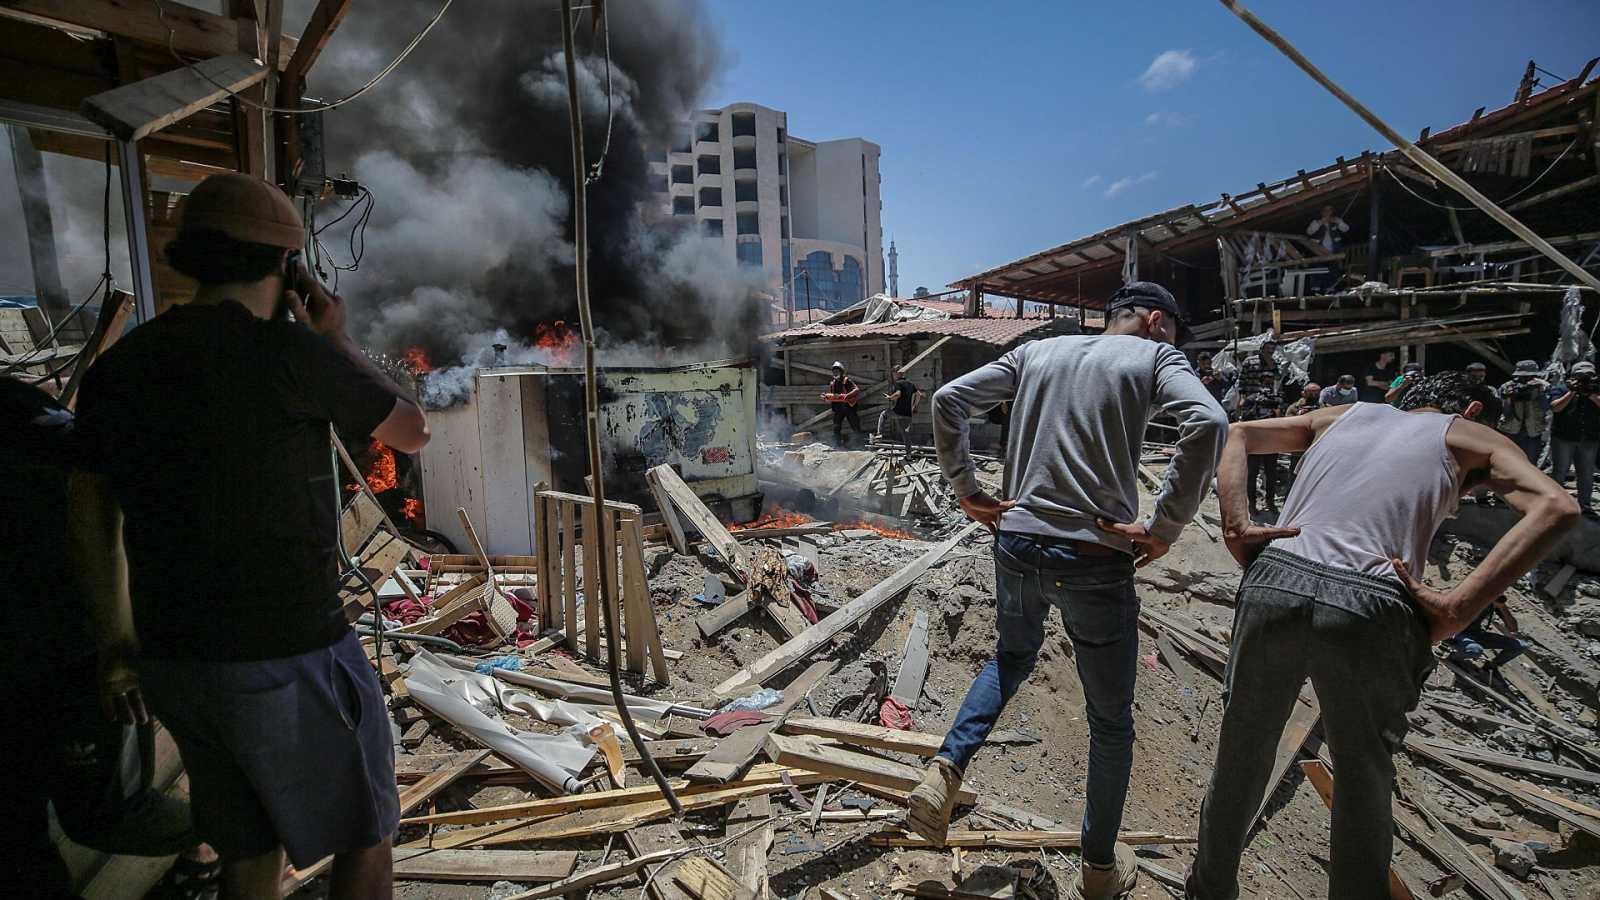 Los bombardeos israelíes continúan sobre Gaza por octavo día consecutivo